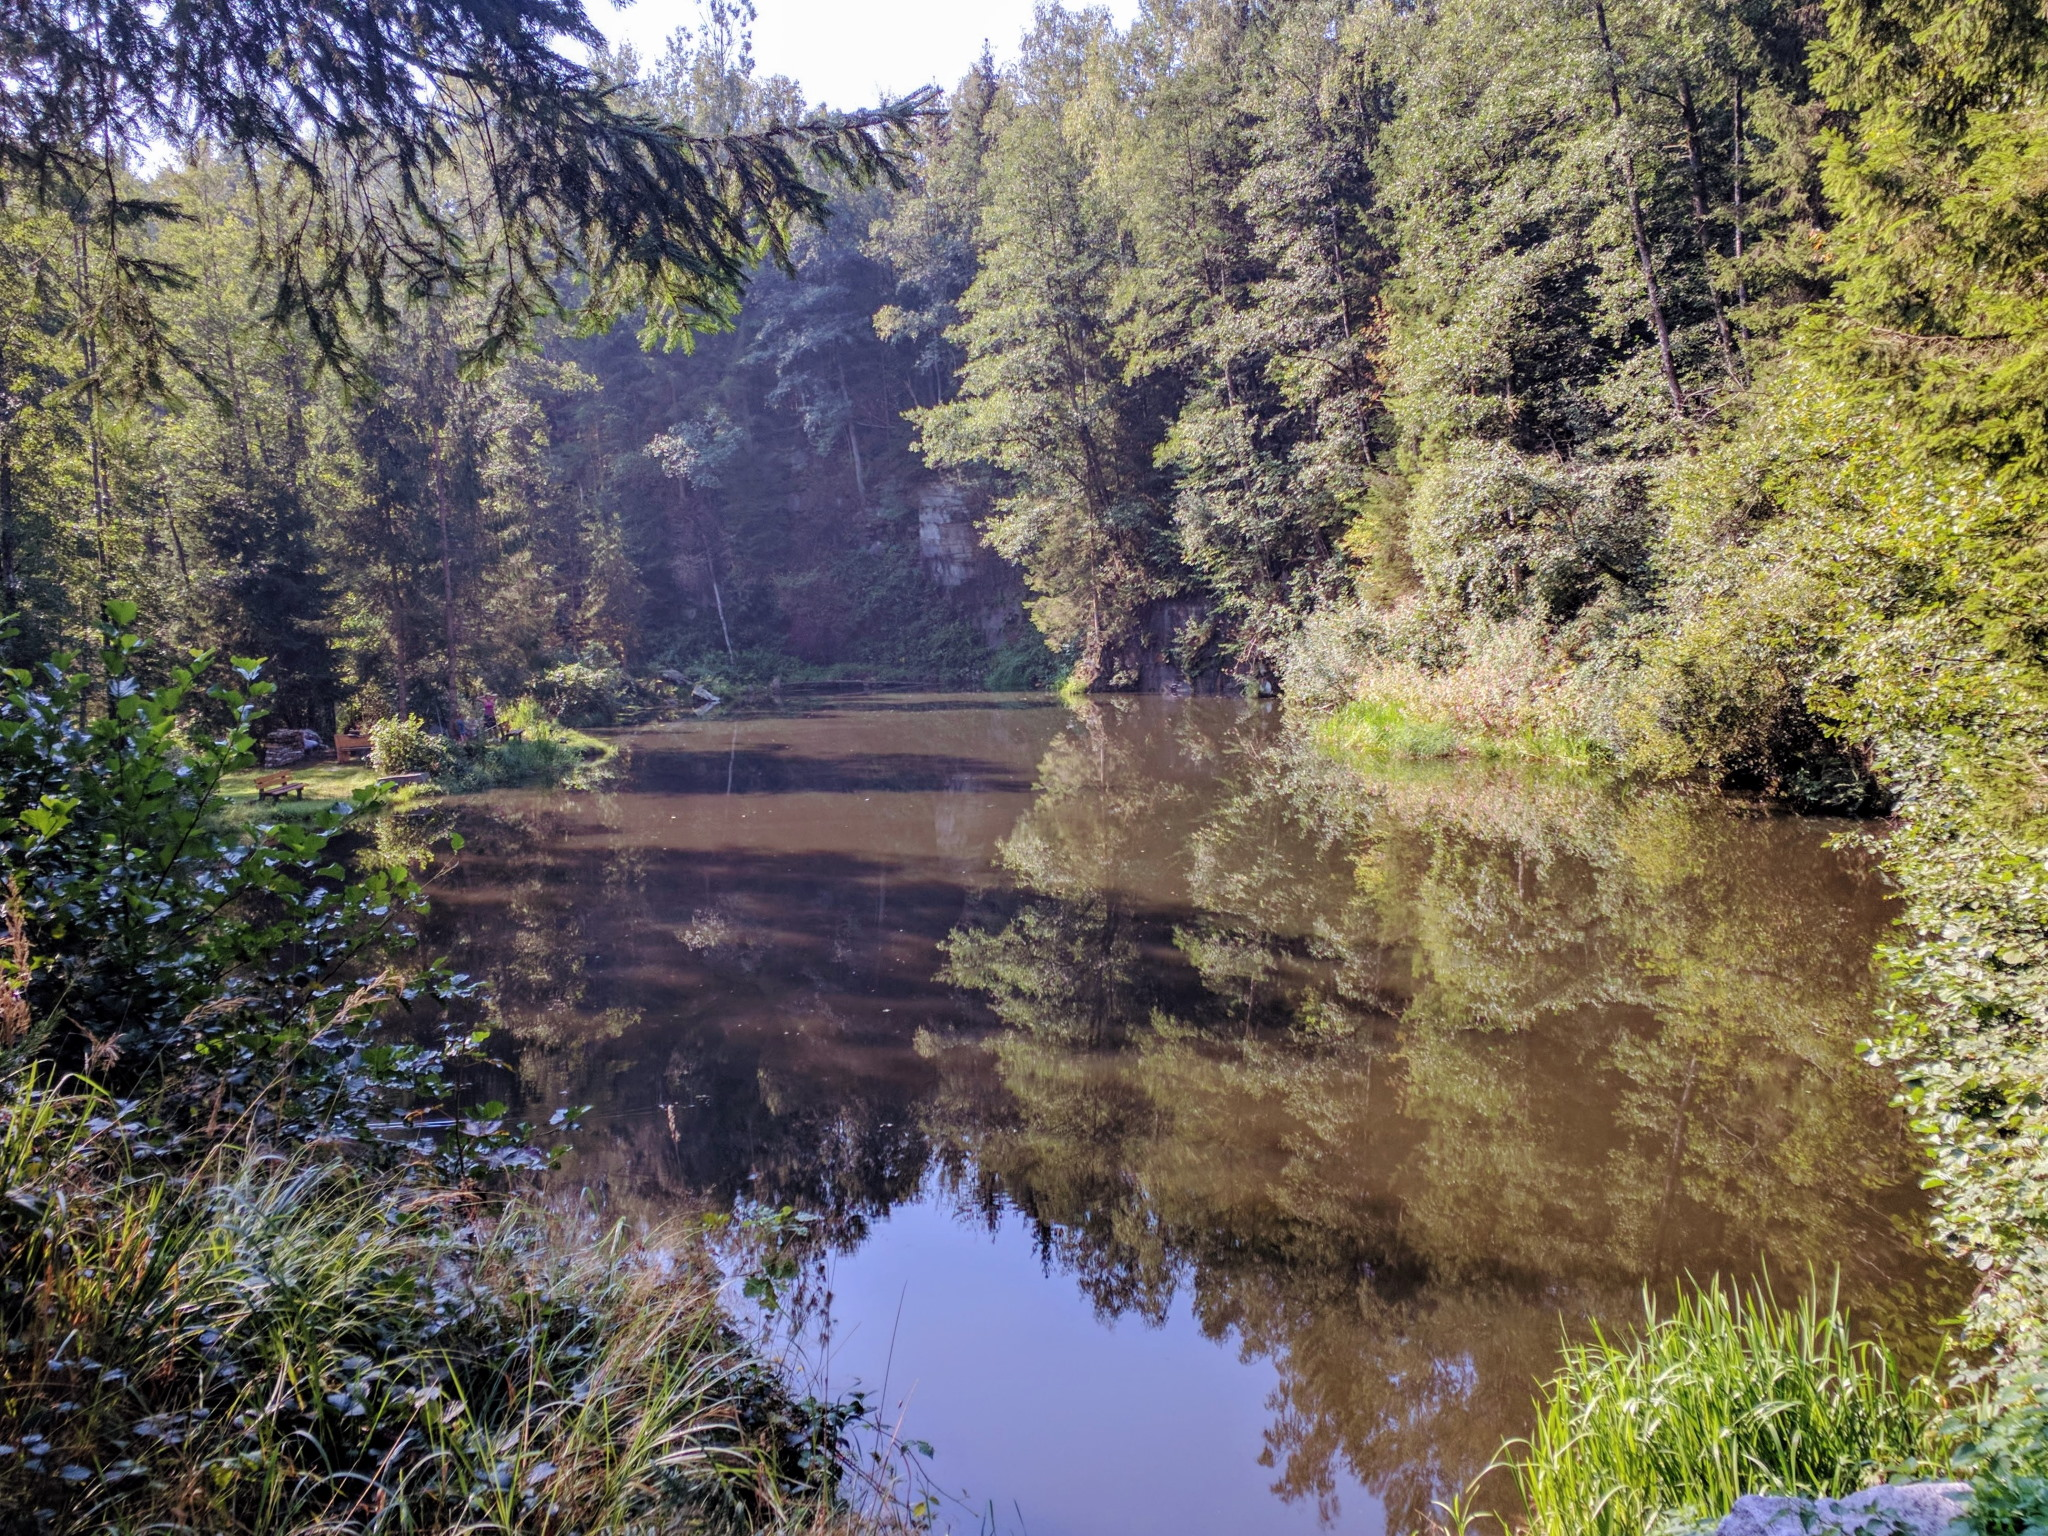 Trans Bayerwald - Kleiner See bei Klaußing